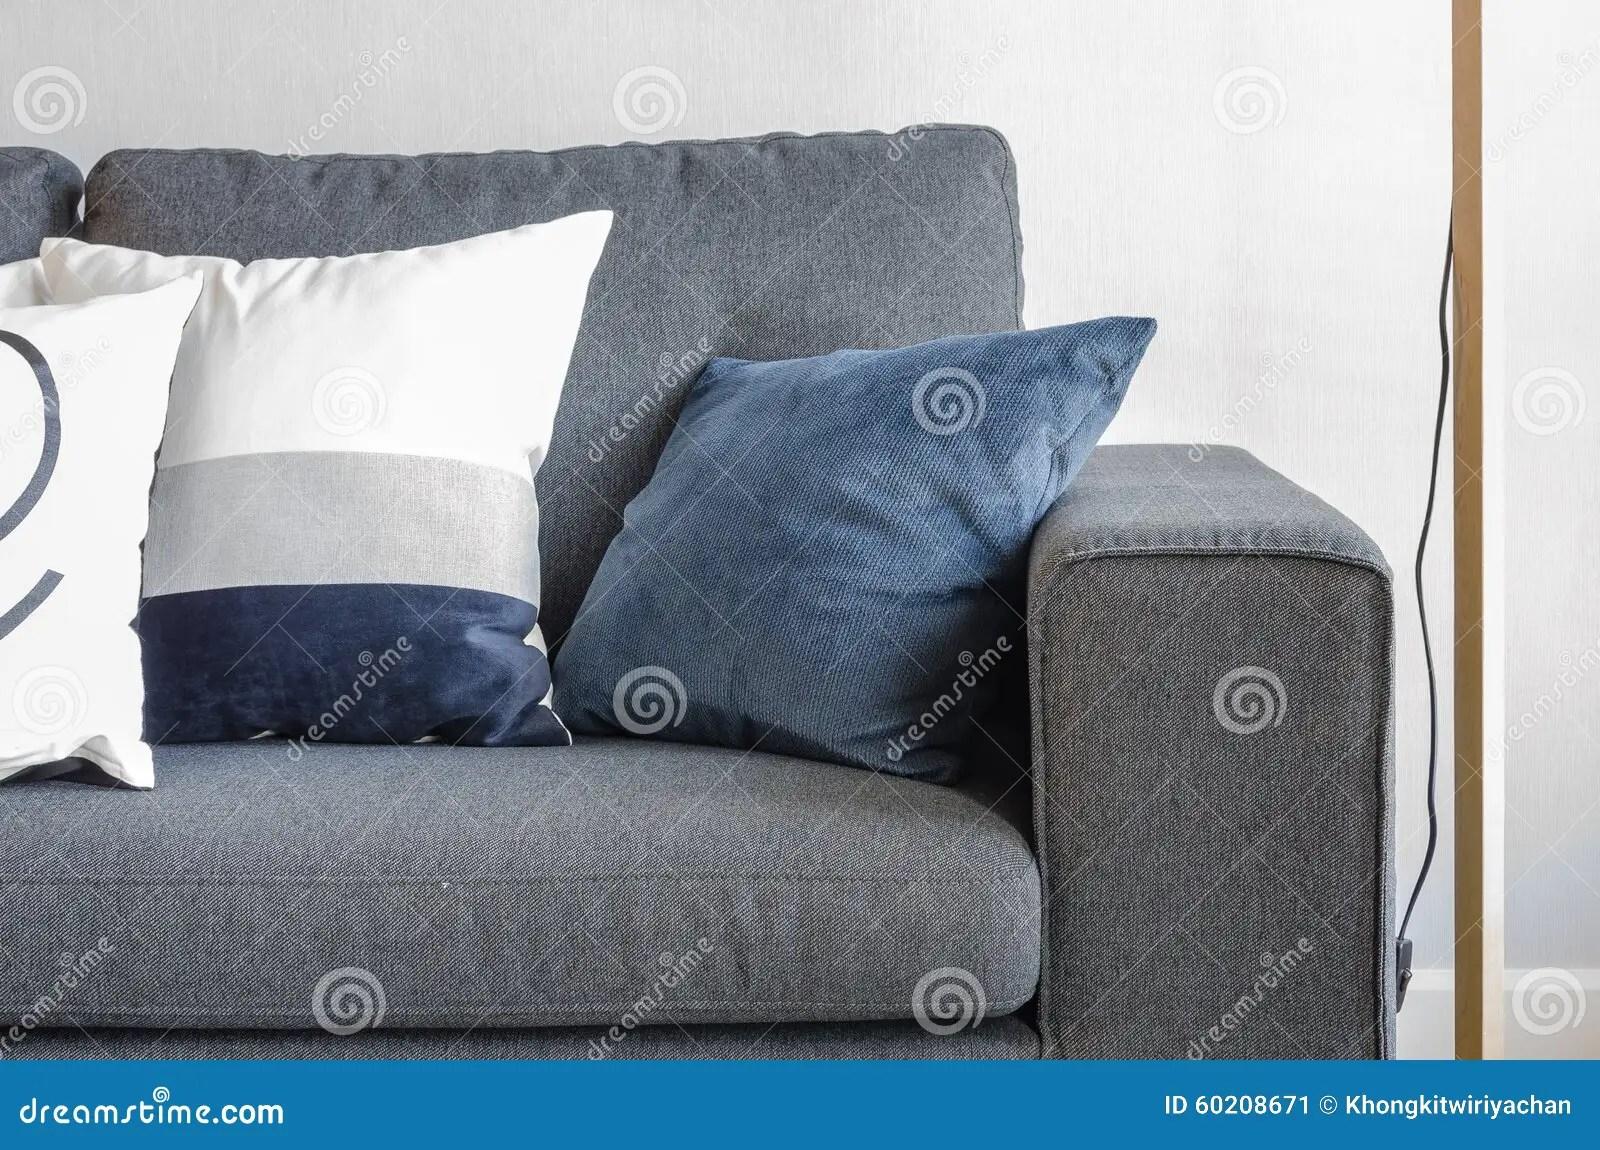 Blue Pillows On Modern Grey Sofa Stock Image  Image 60208671